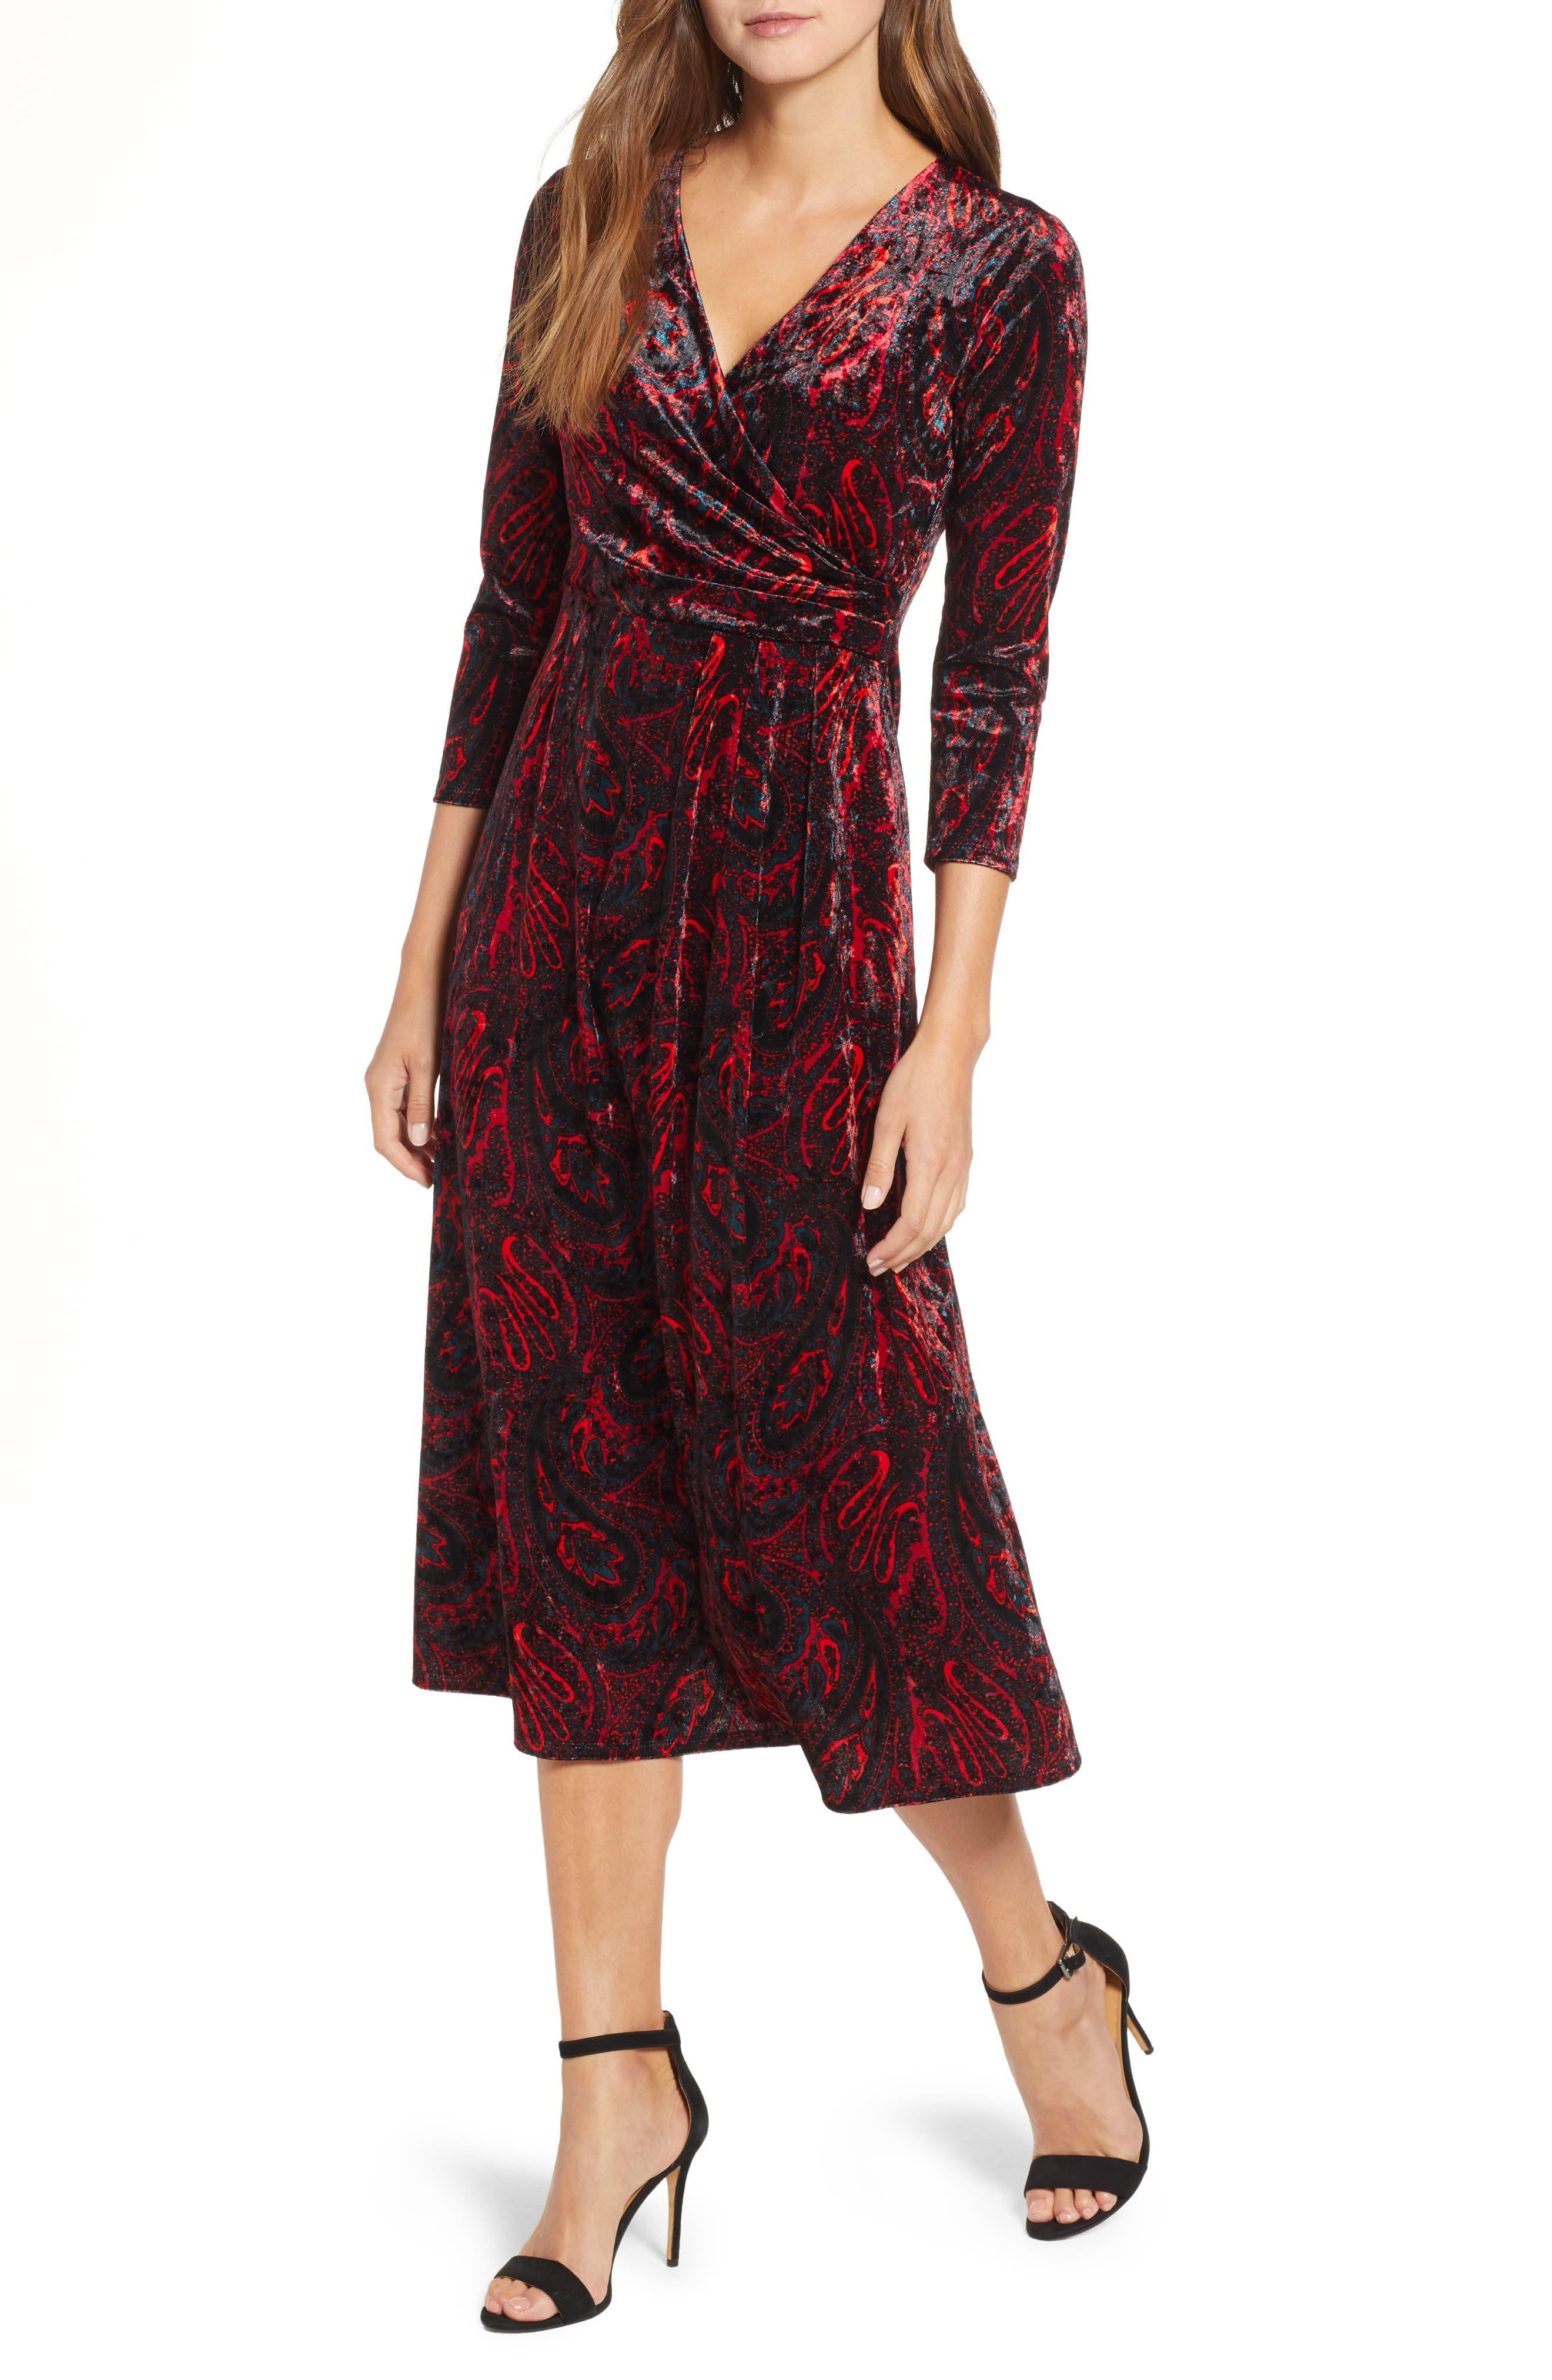 Vintage Christmas Dress | Party Dresses | Night Out Outfits Womens Chaus Paisley Velvet Faux Wrap Dress $81.75 AT vintagedancer.com